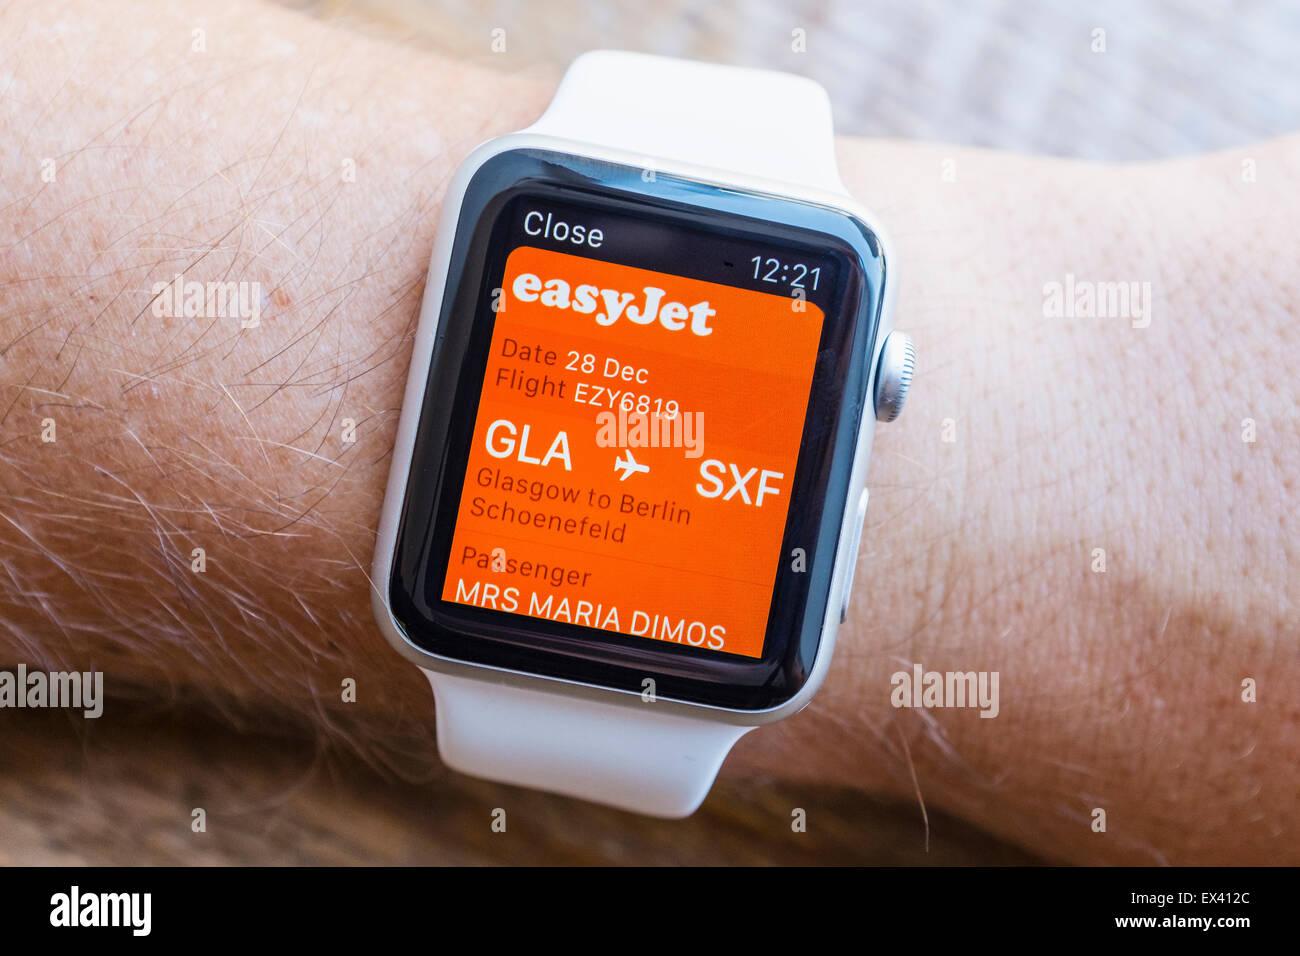 Easyjet boarding pass on Passbook app on an Apple Watch - Stock Image